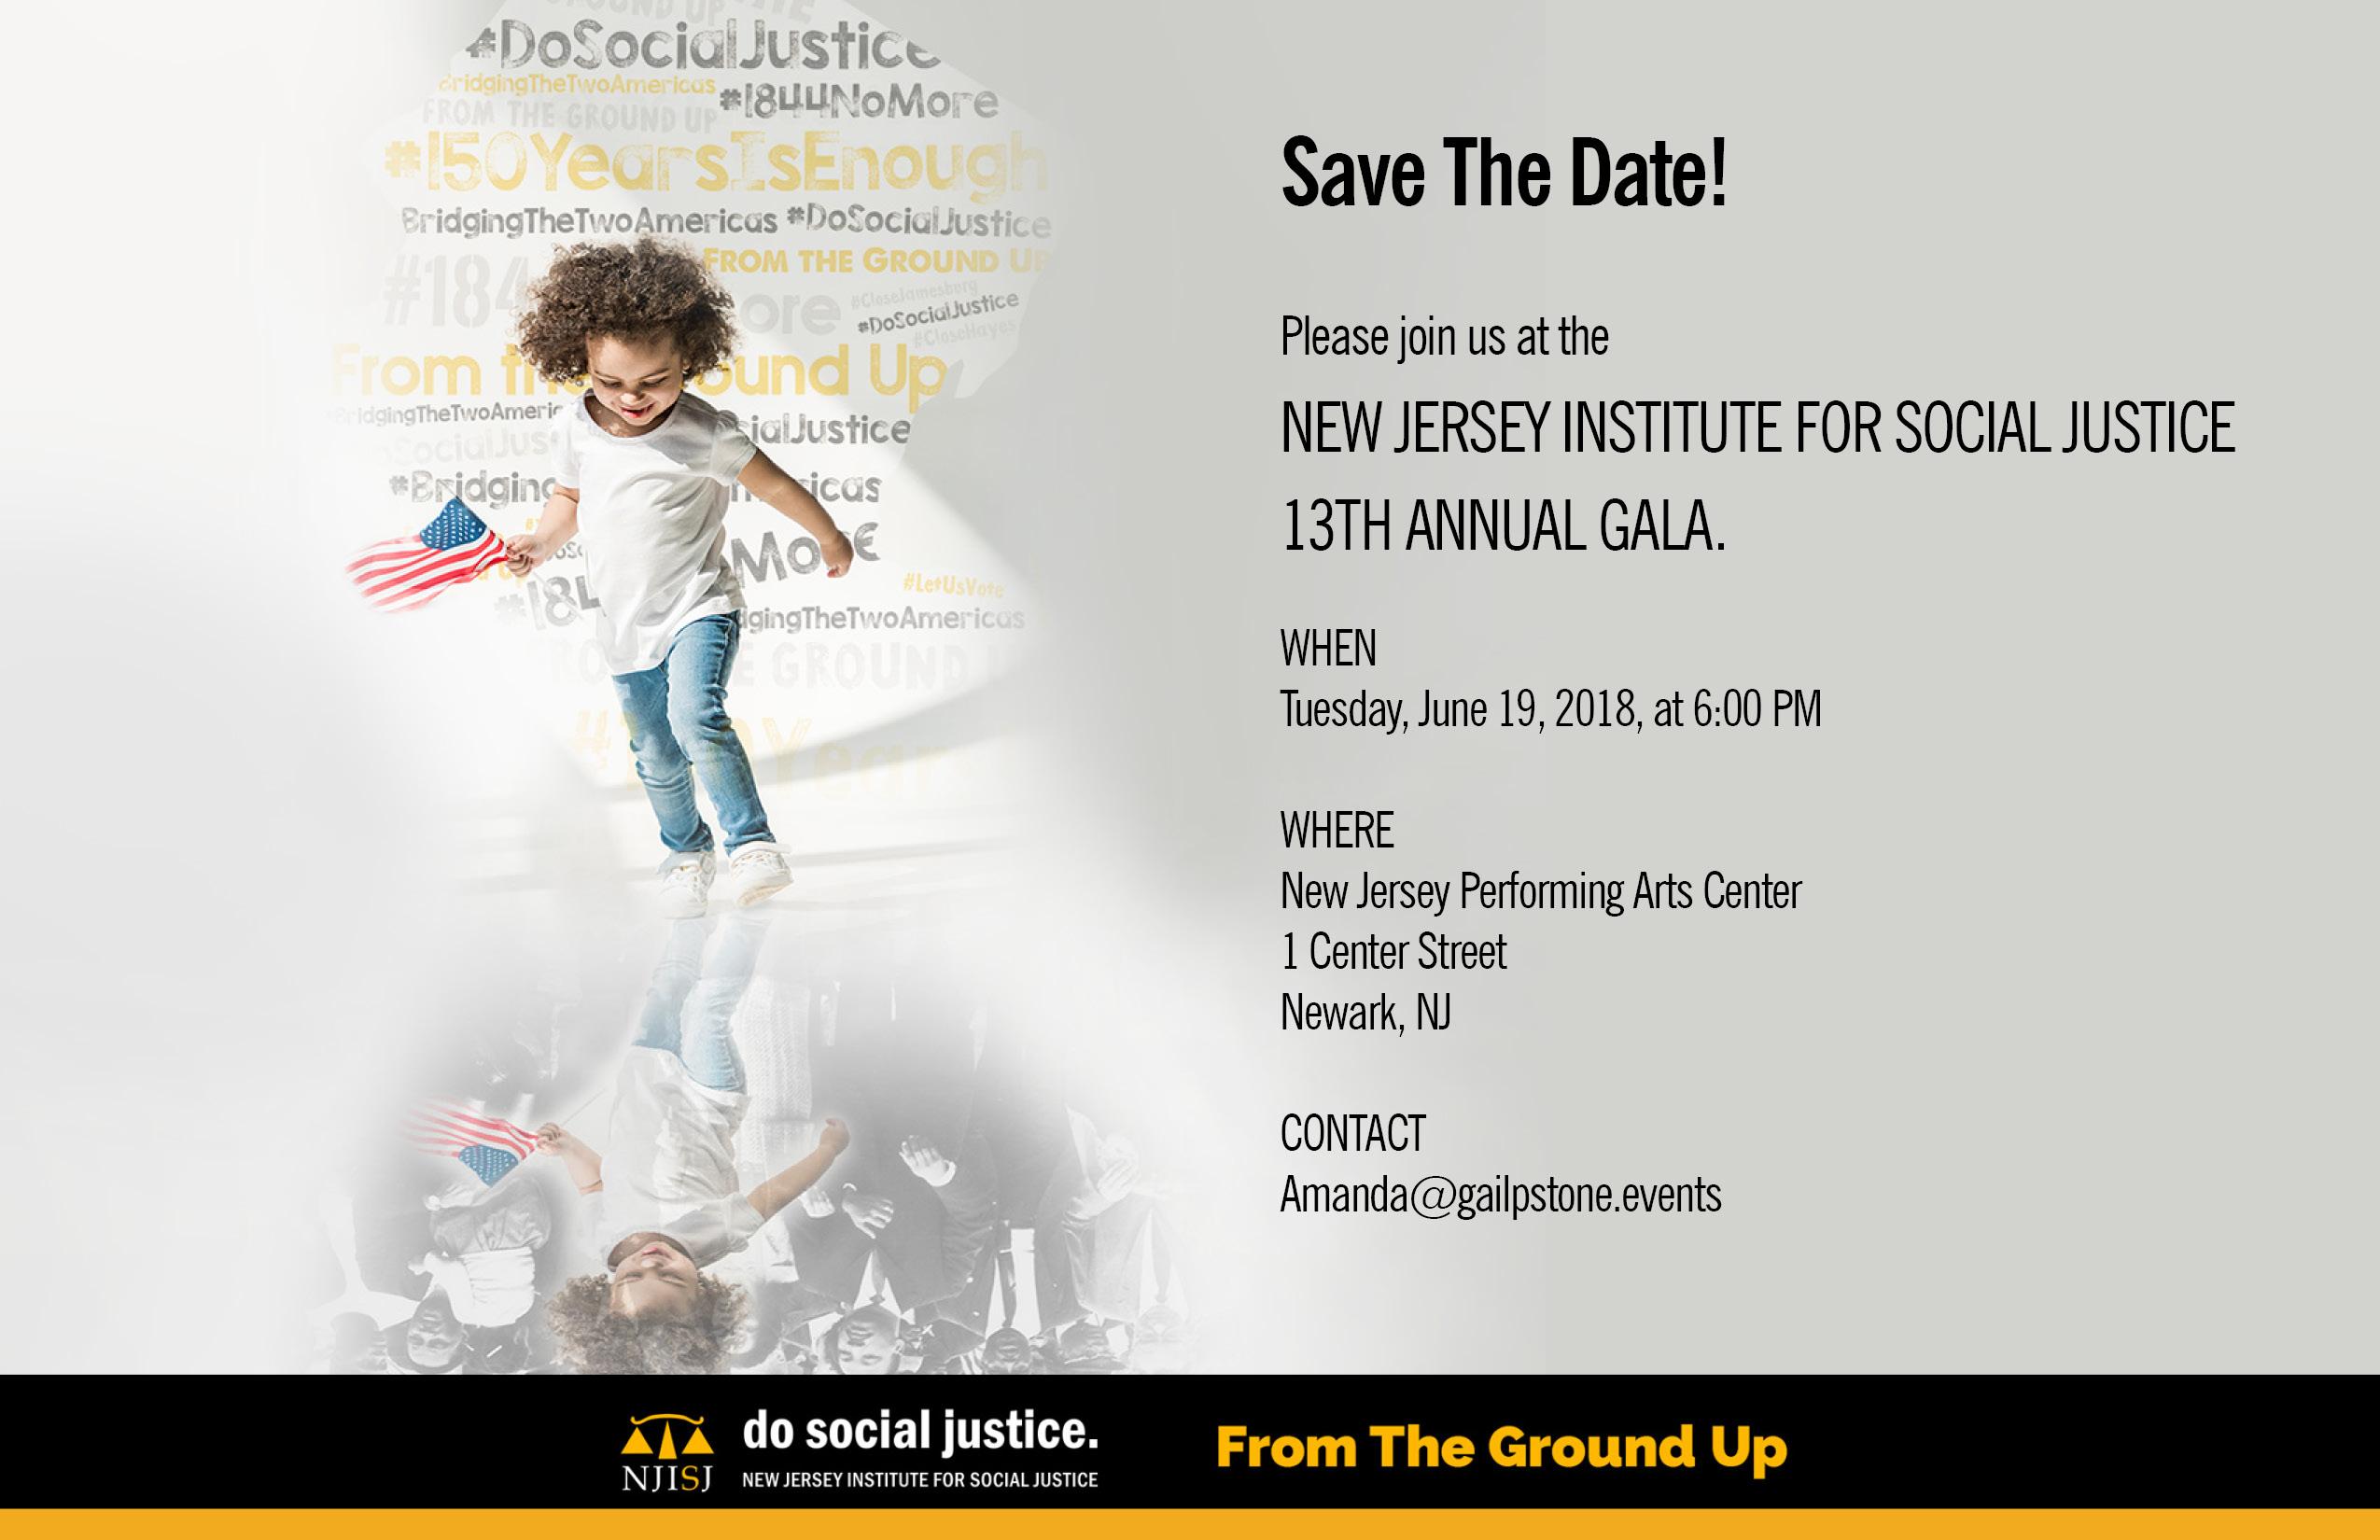 Gala_Save_the_Date_w_6_PM_start.jpg